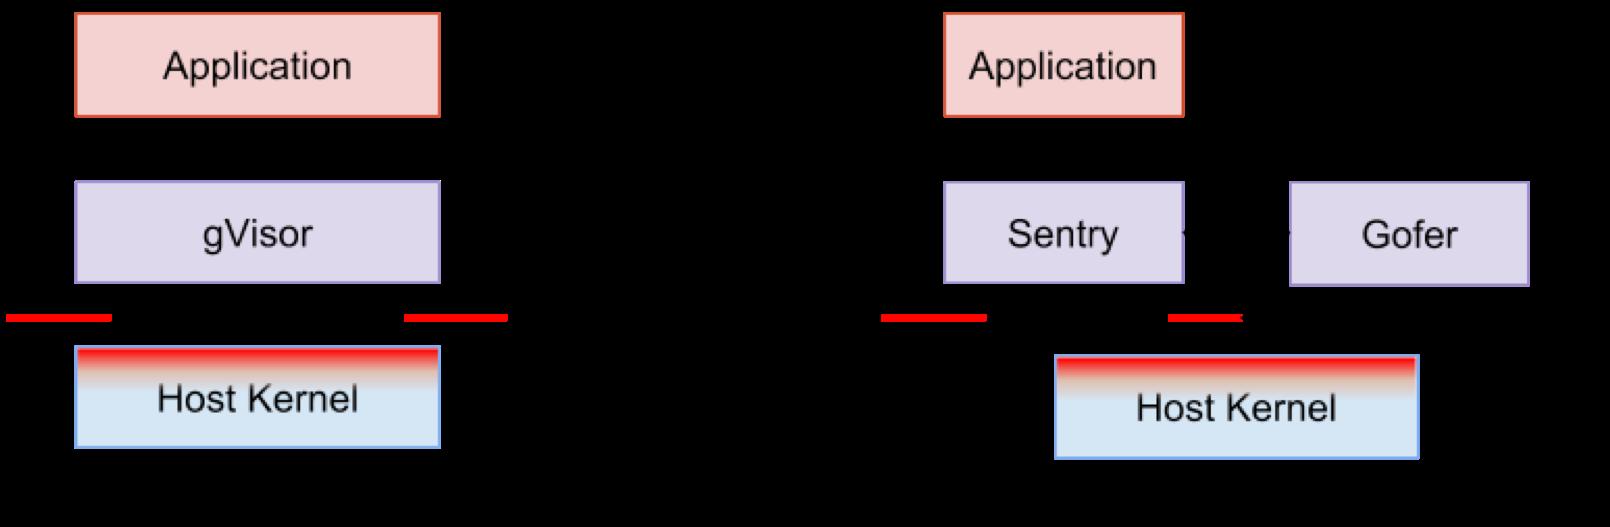 图5 gVisor架构图(来自gVisor)